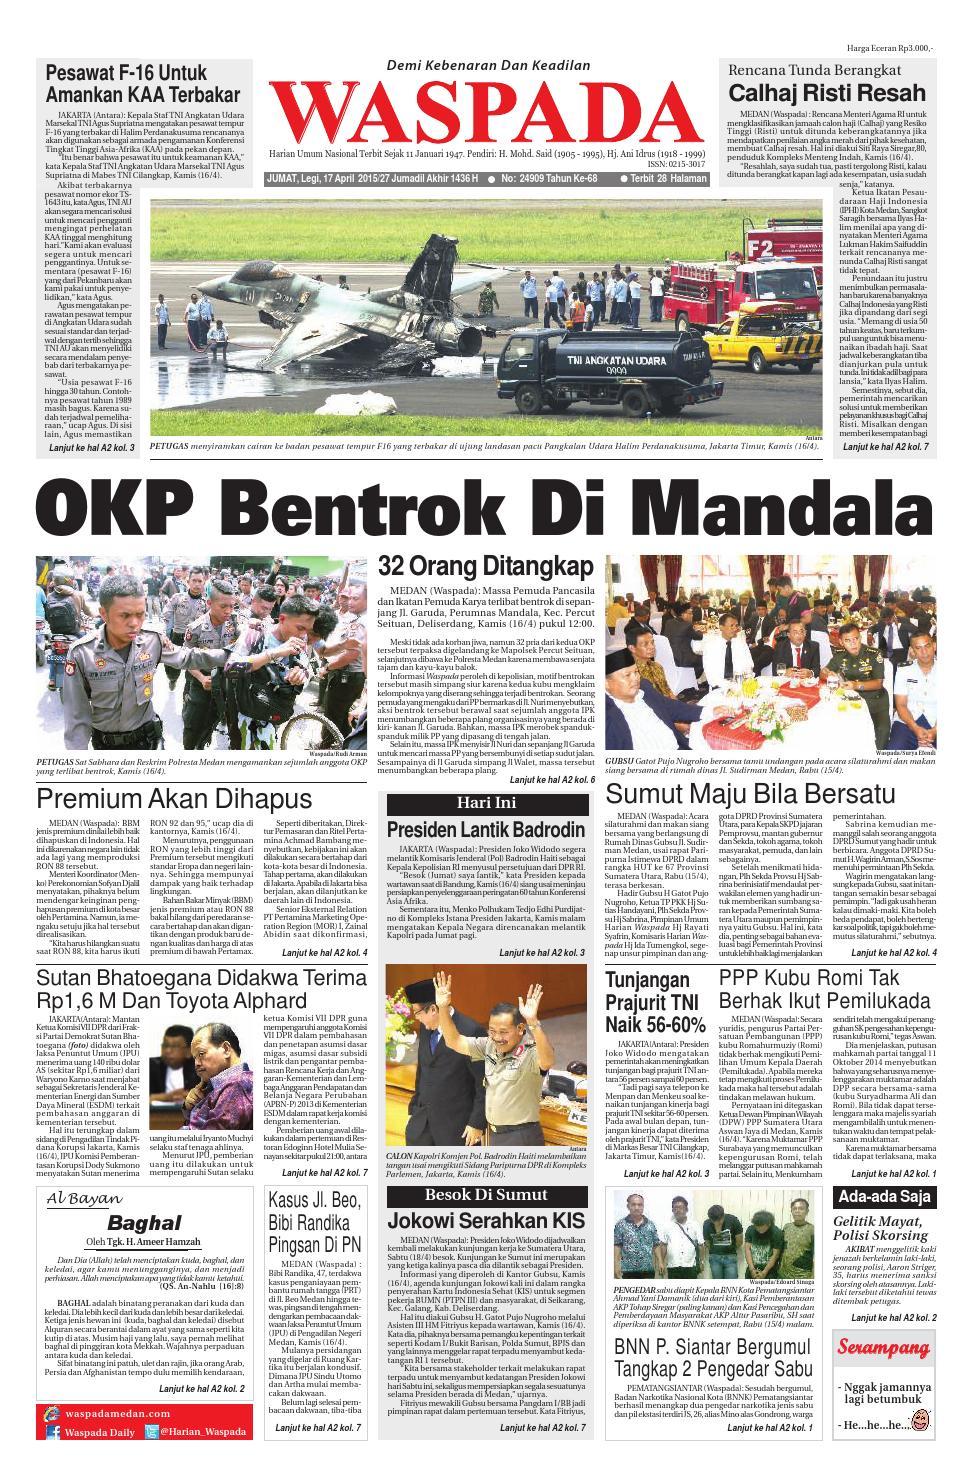 Waspada Jumat 17 April 2015 By Harian Issuu Produk Ukm Bumn Barbekyu Kelitik Surabaya